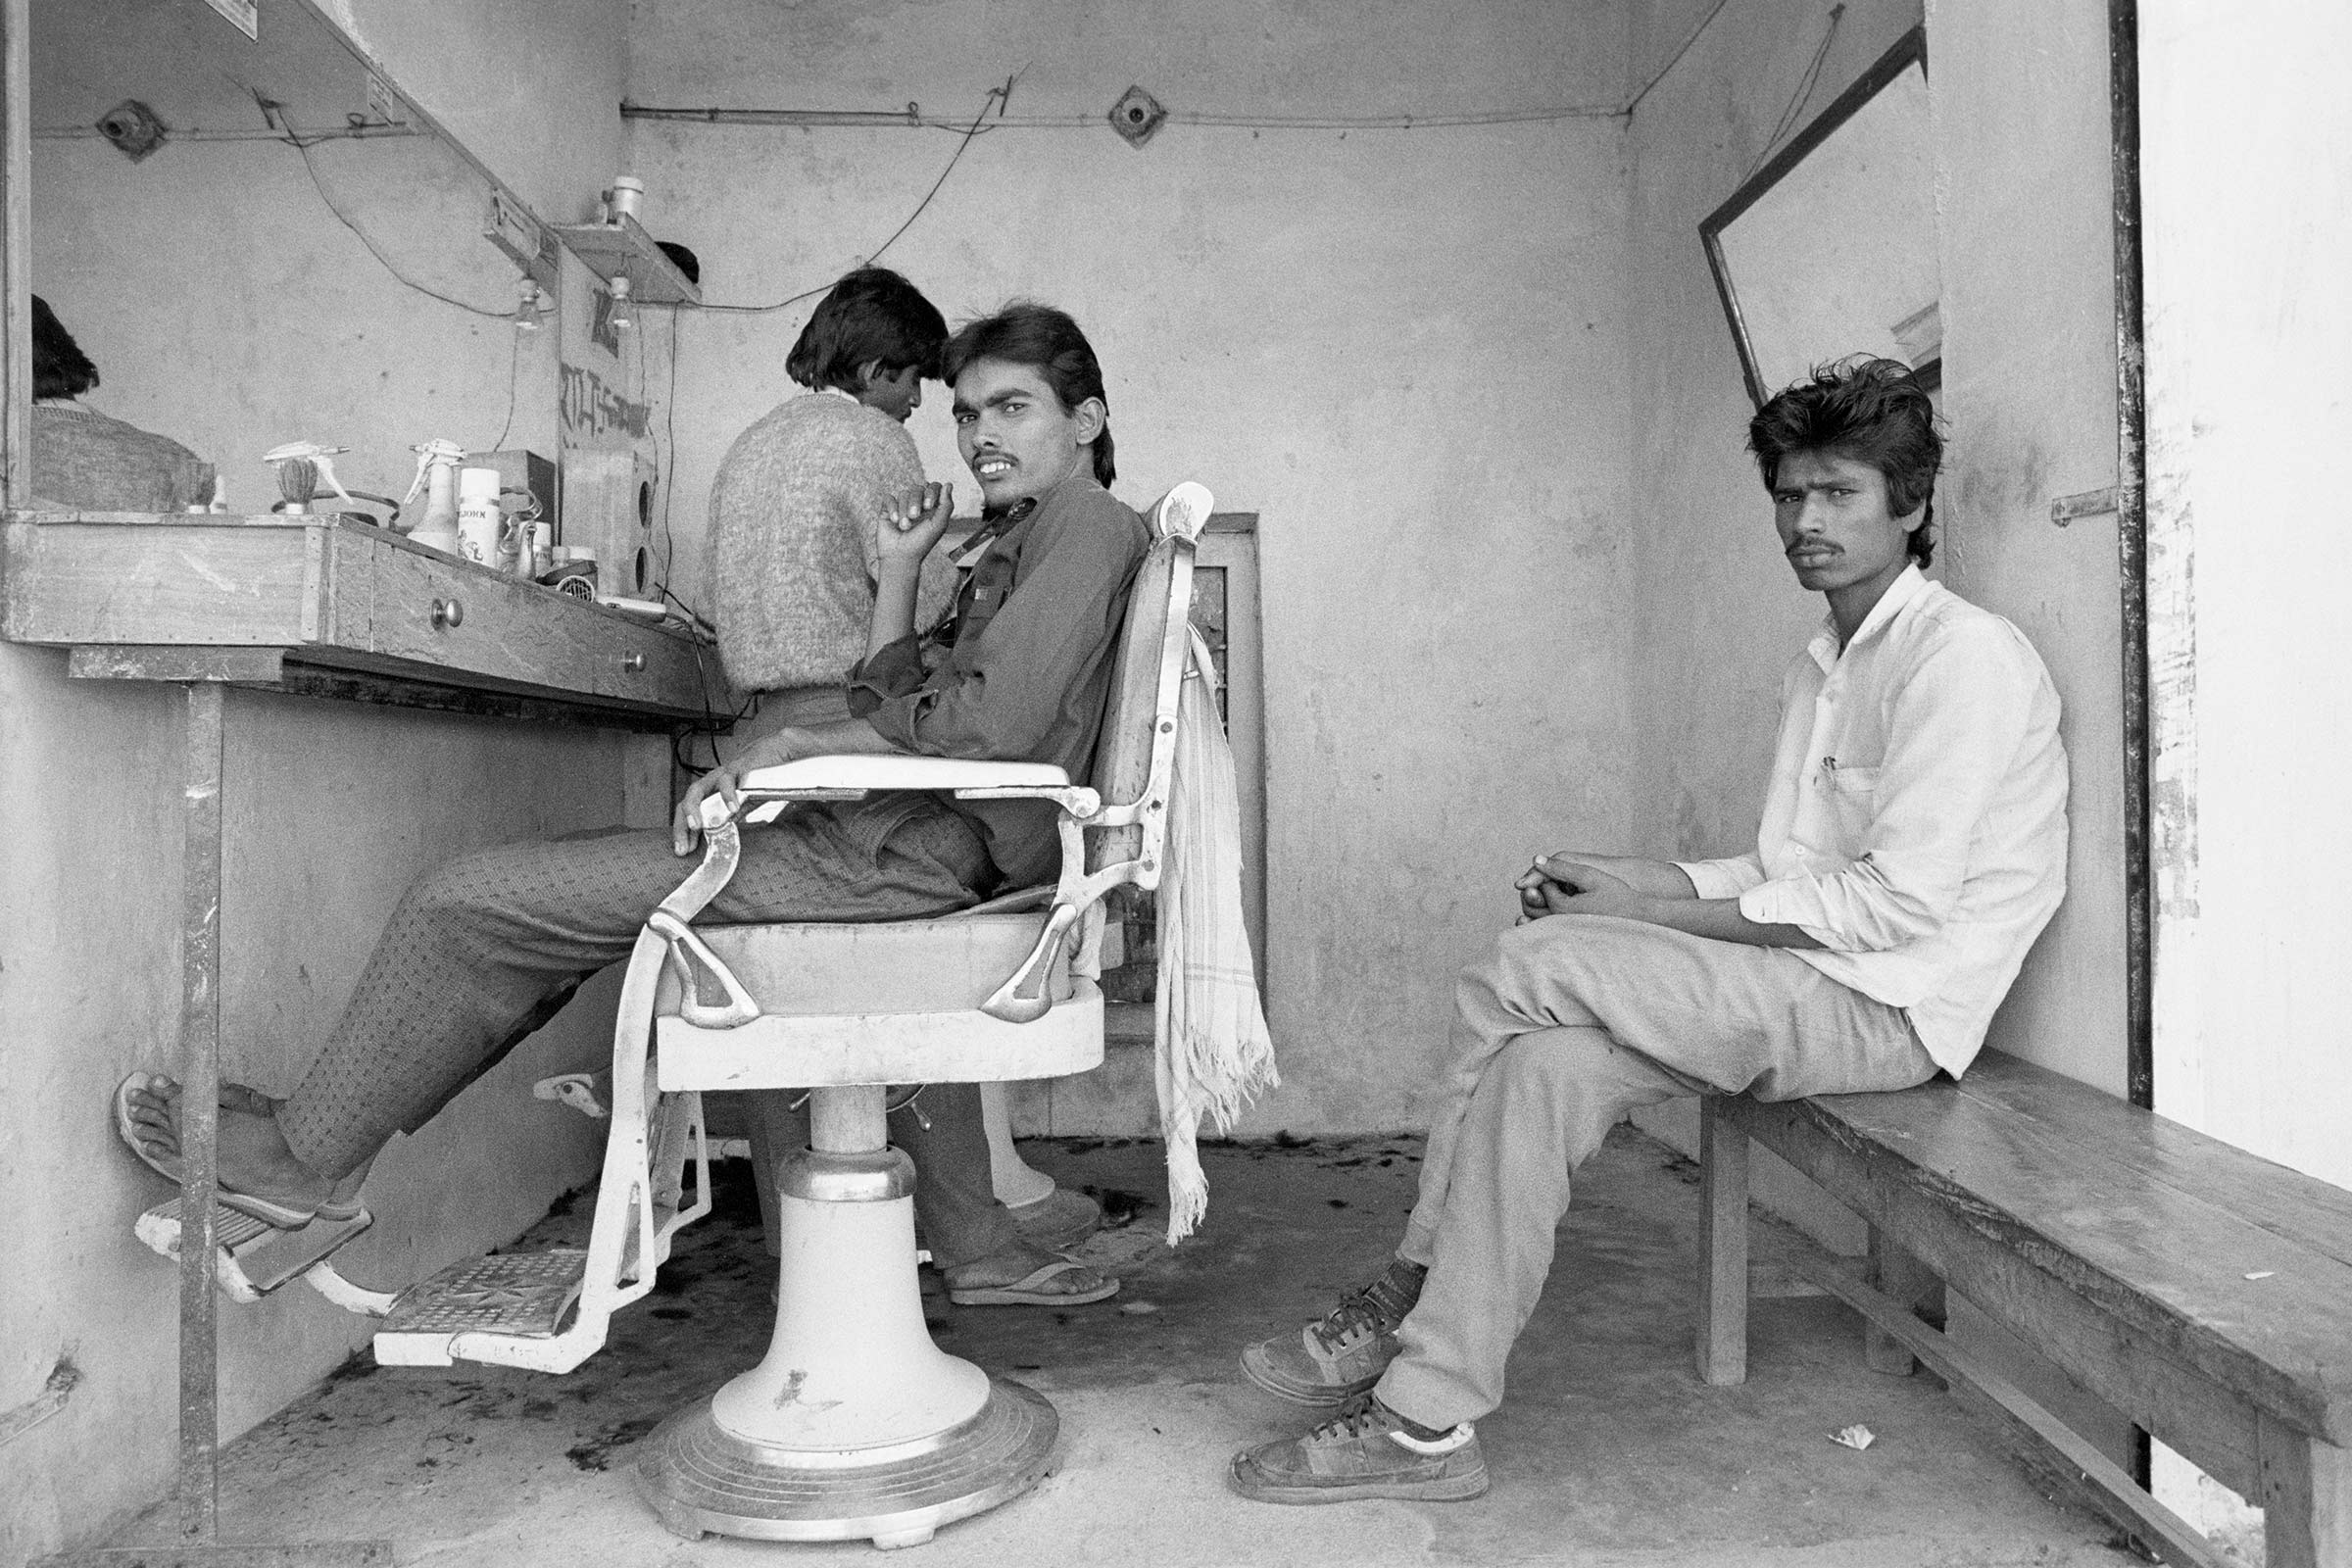 Gwalior november 1991